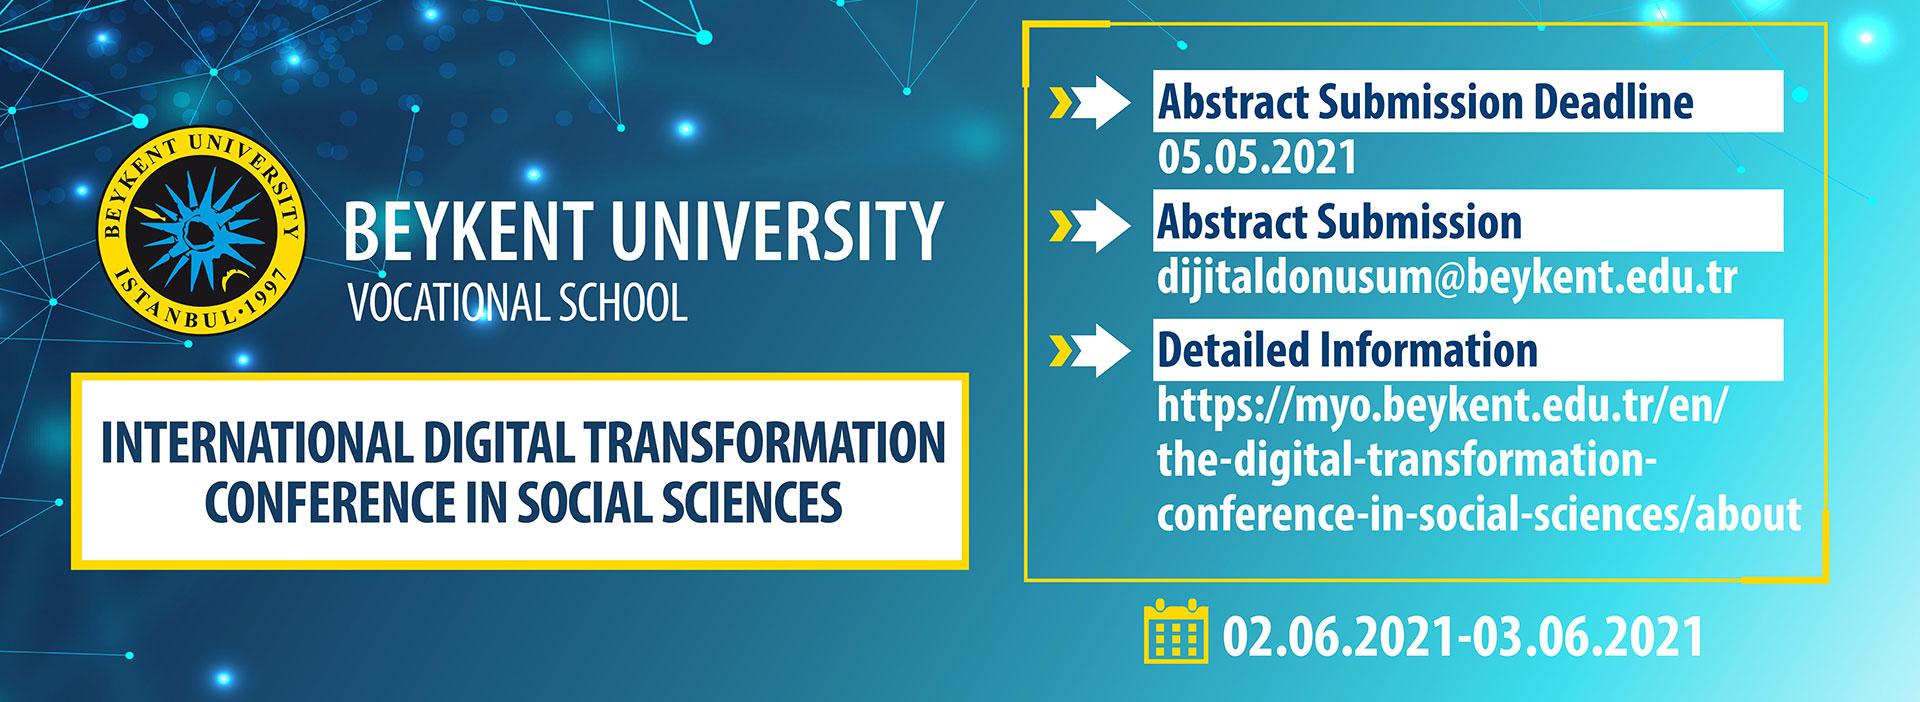 dijital-transformation-in-social-sciences1920-700